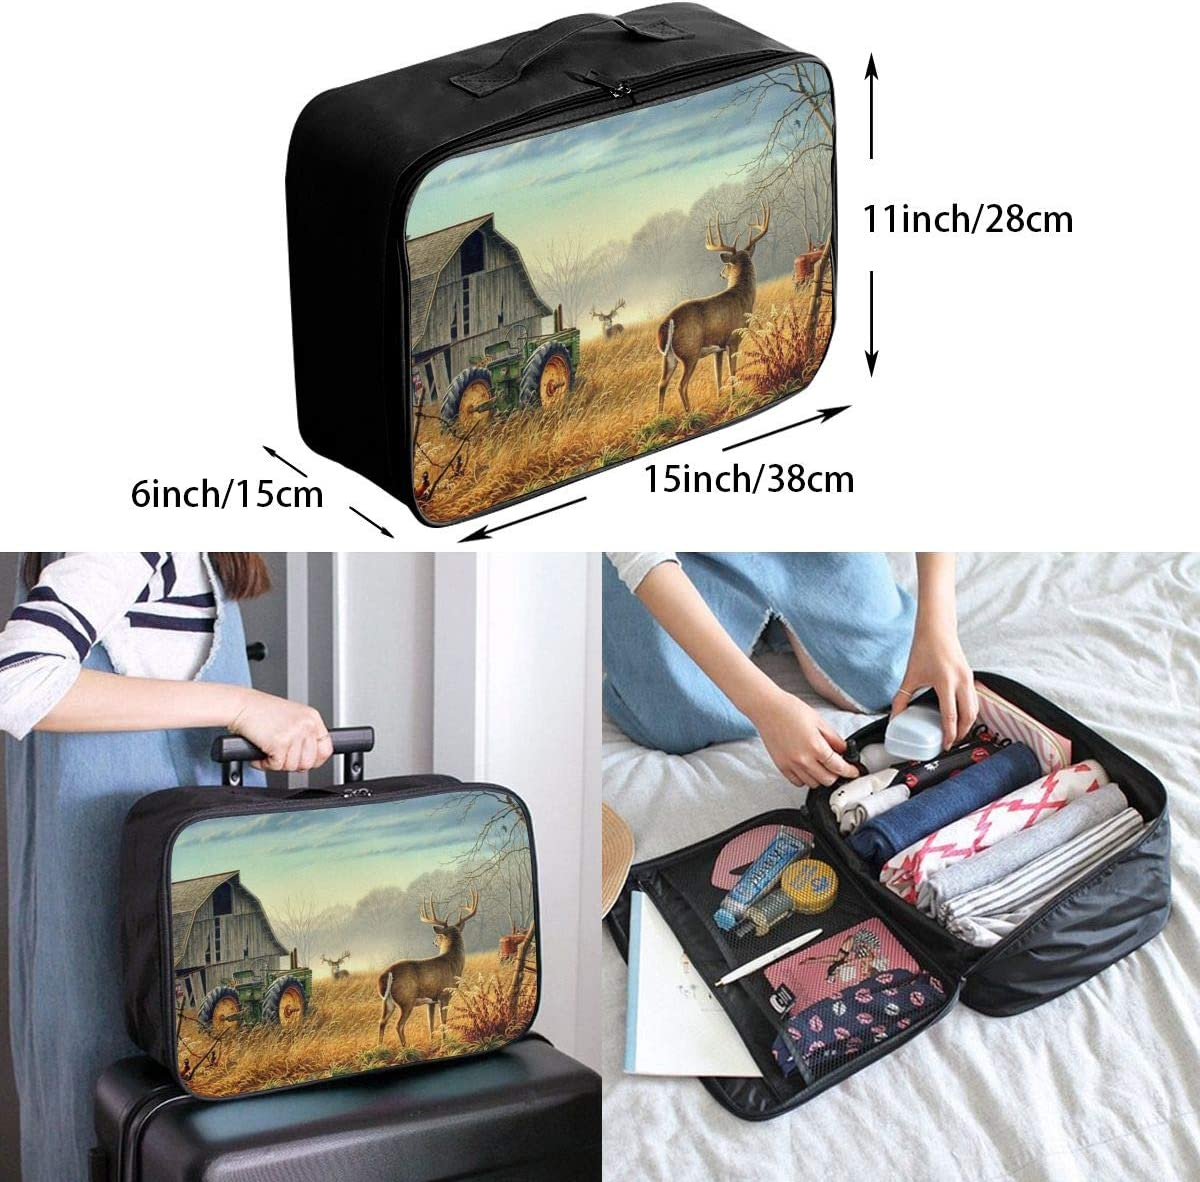 Sloth Travel Carry-on Luggage Weekender Bag Overnight Tote Flight Duffel In Trolley Handle